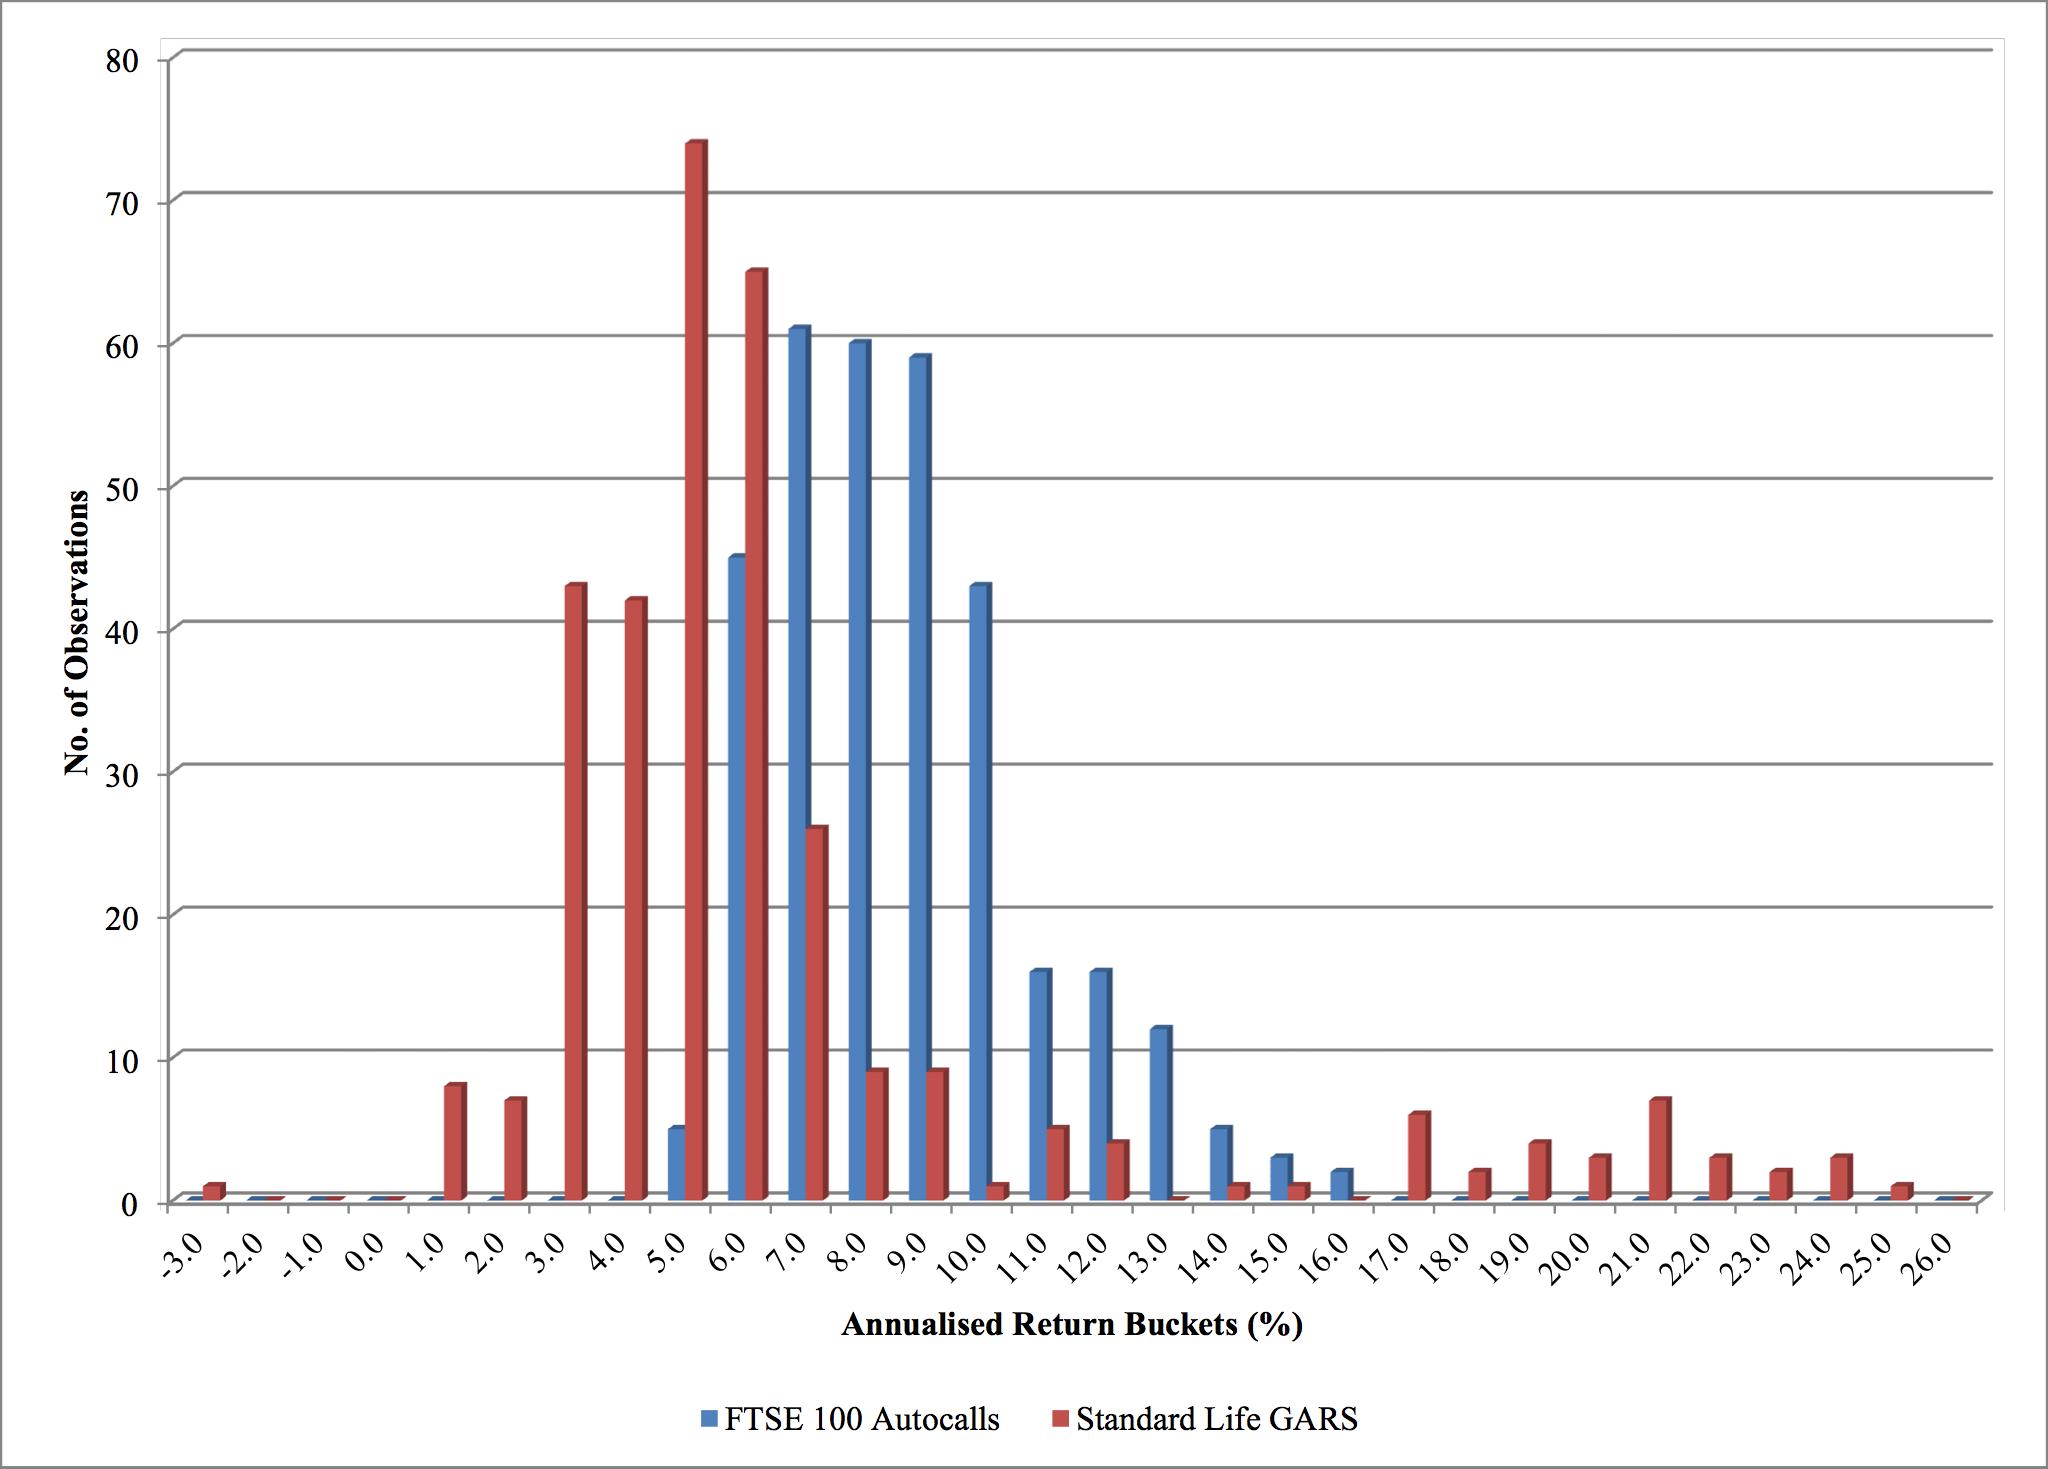 Distribution of Returns - FTSE 100 Autocalls vs GARS